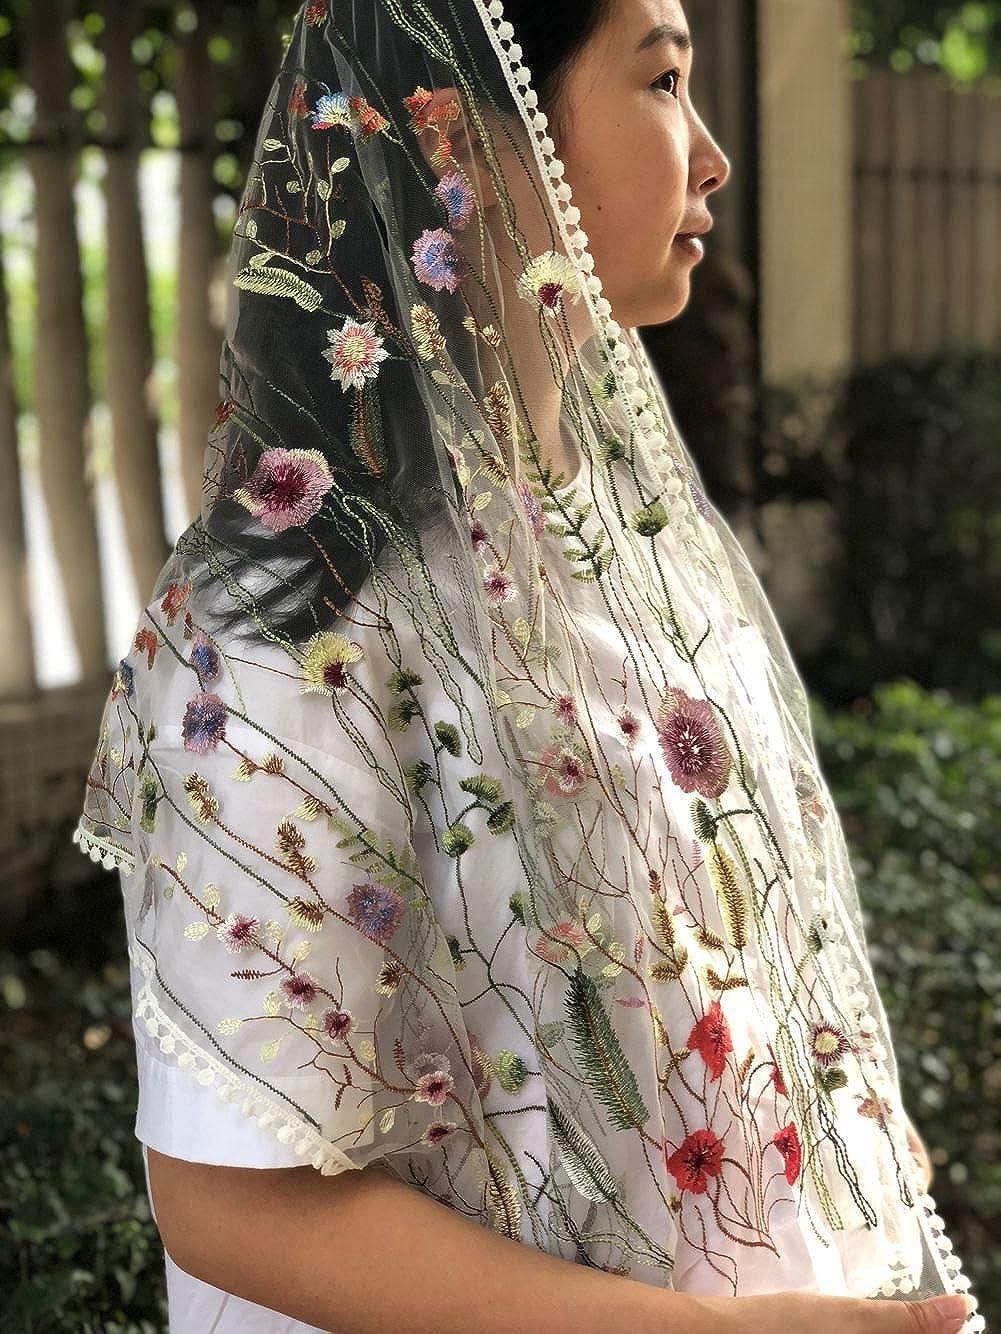 FANFAN Wildflowers Floral Lace Wrap Mantilla Floral Vintage Inspired Lace Chapel Veil Y038